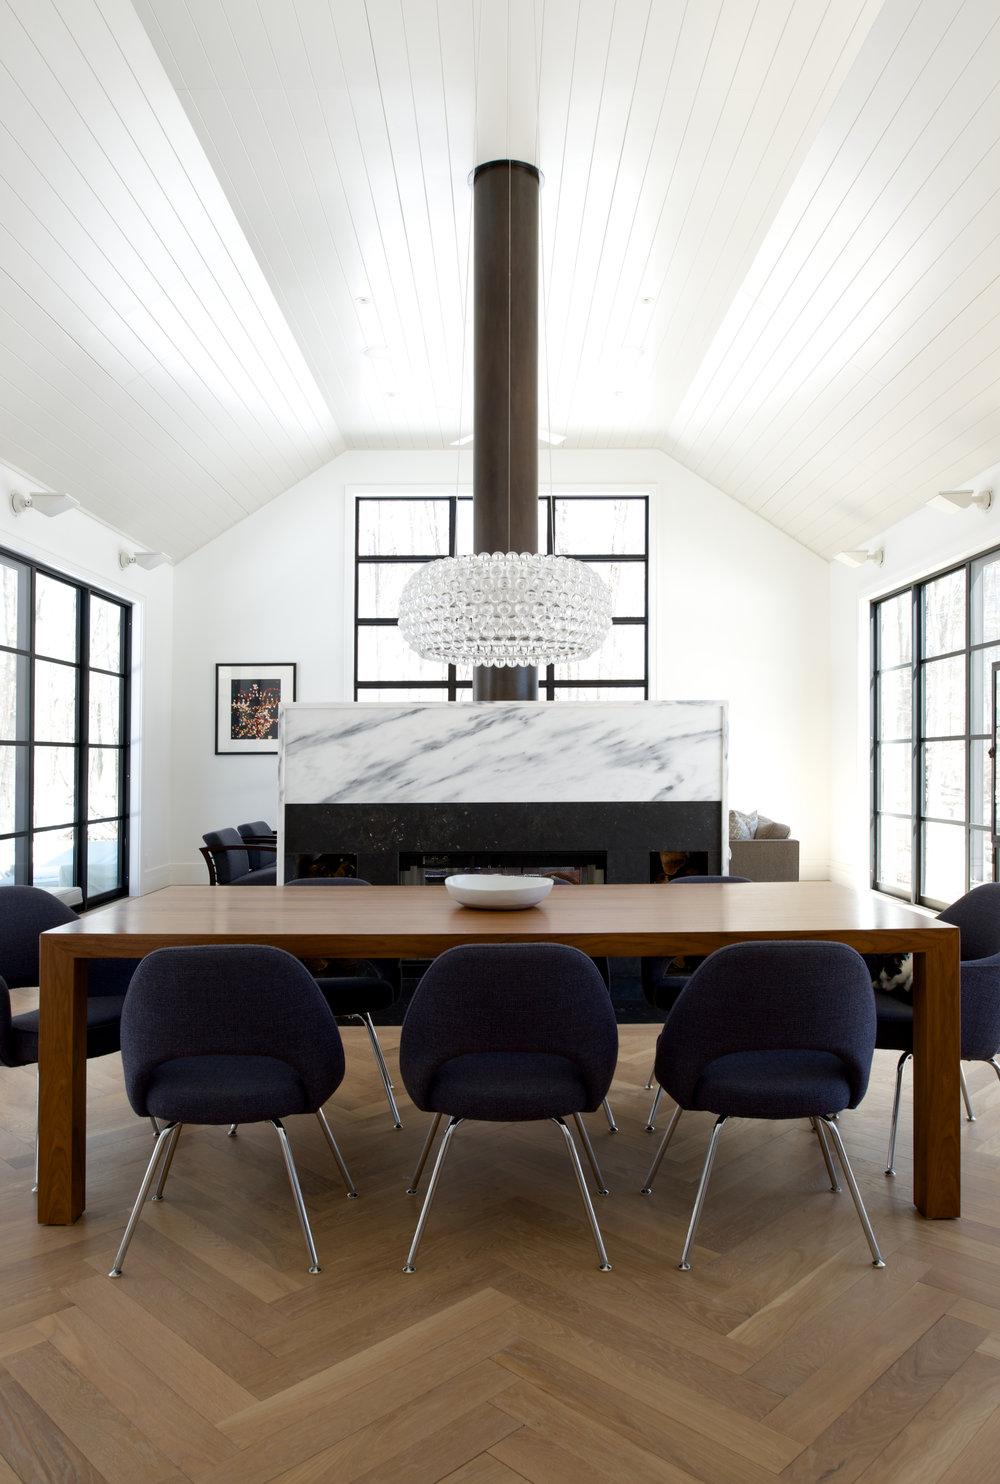 Architectural Digest June 2016